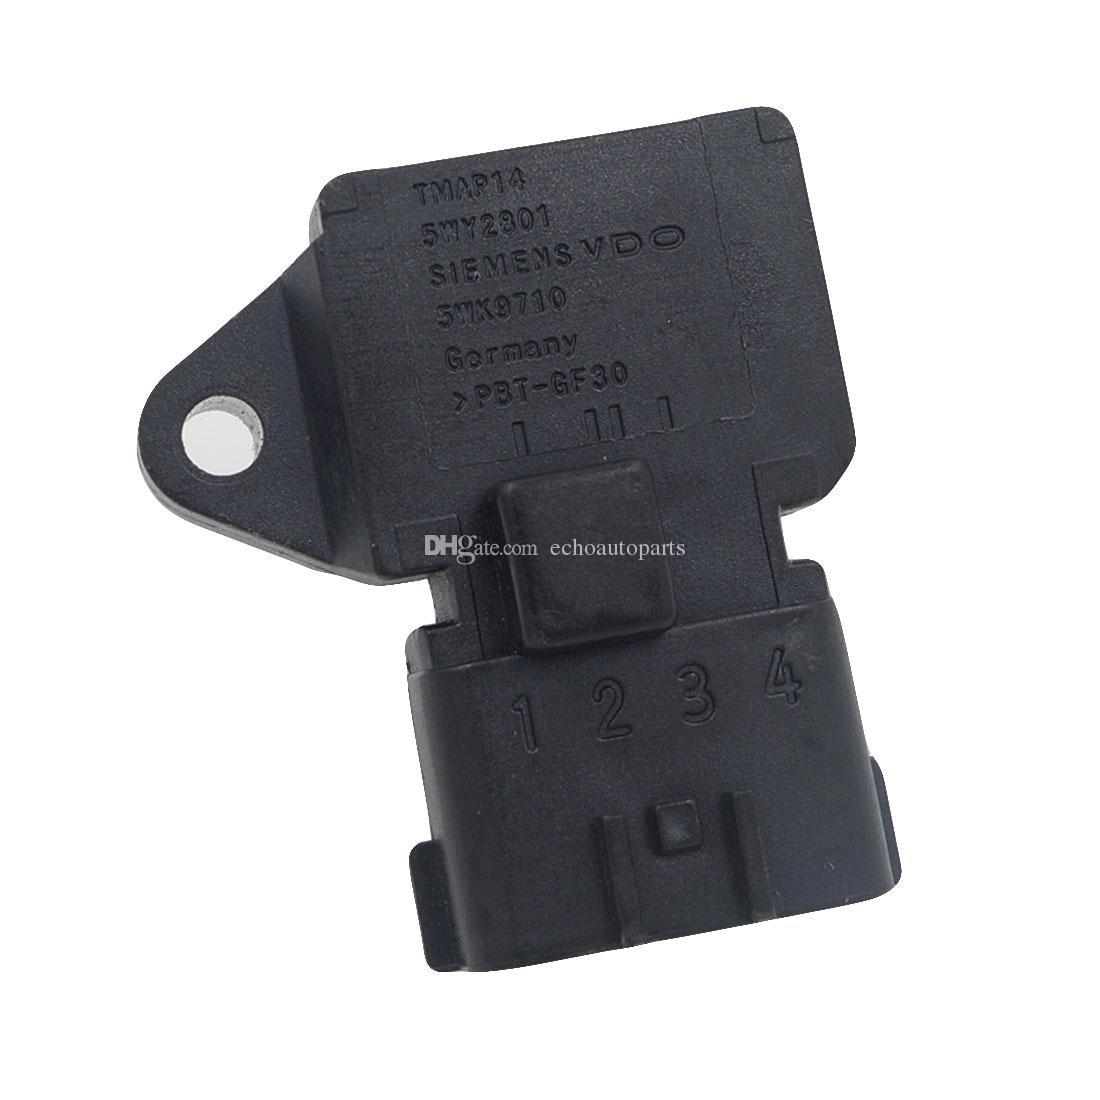 Brand New Intake Air Pressure Sensor MAP Sensor Fit For Hyundai Kia 5WY2801 TMAP14 5WK9710 5WY2801A